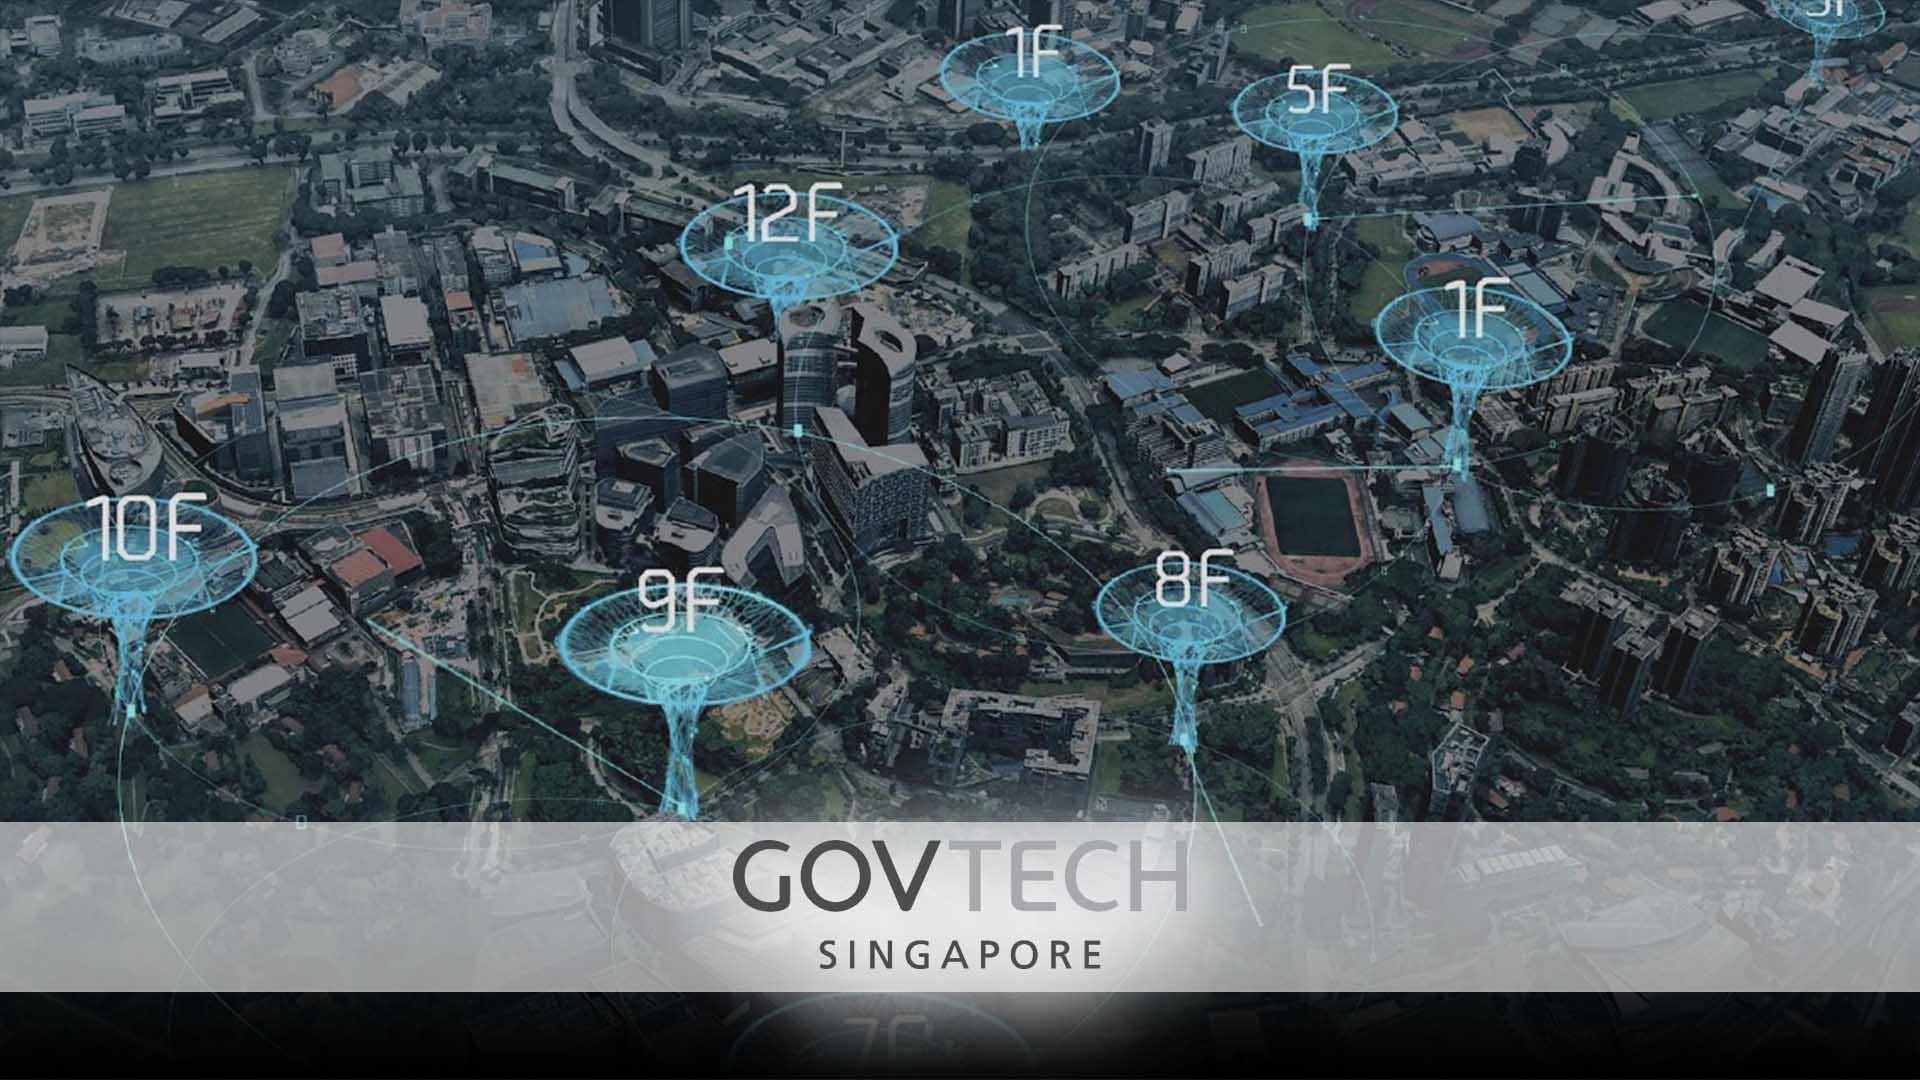 GovTech Real-time Data Visualization